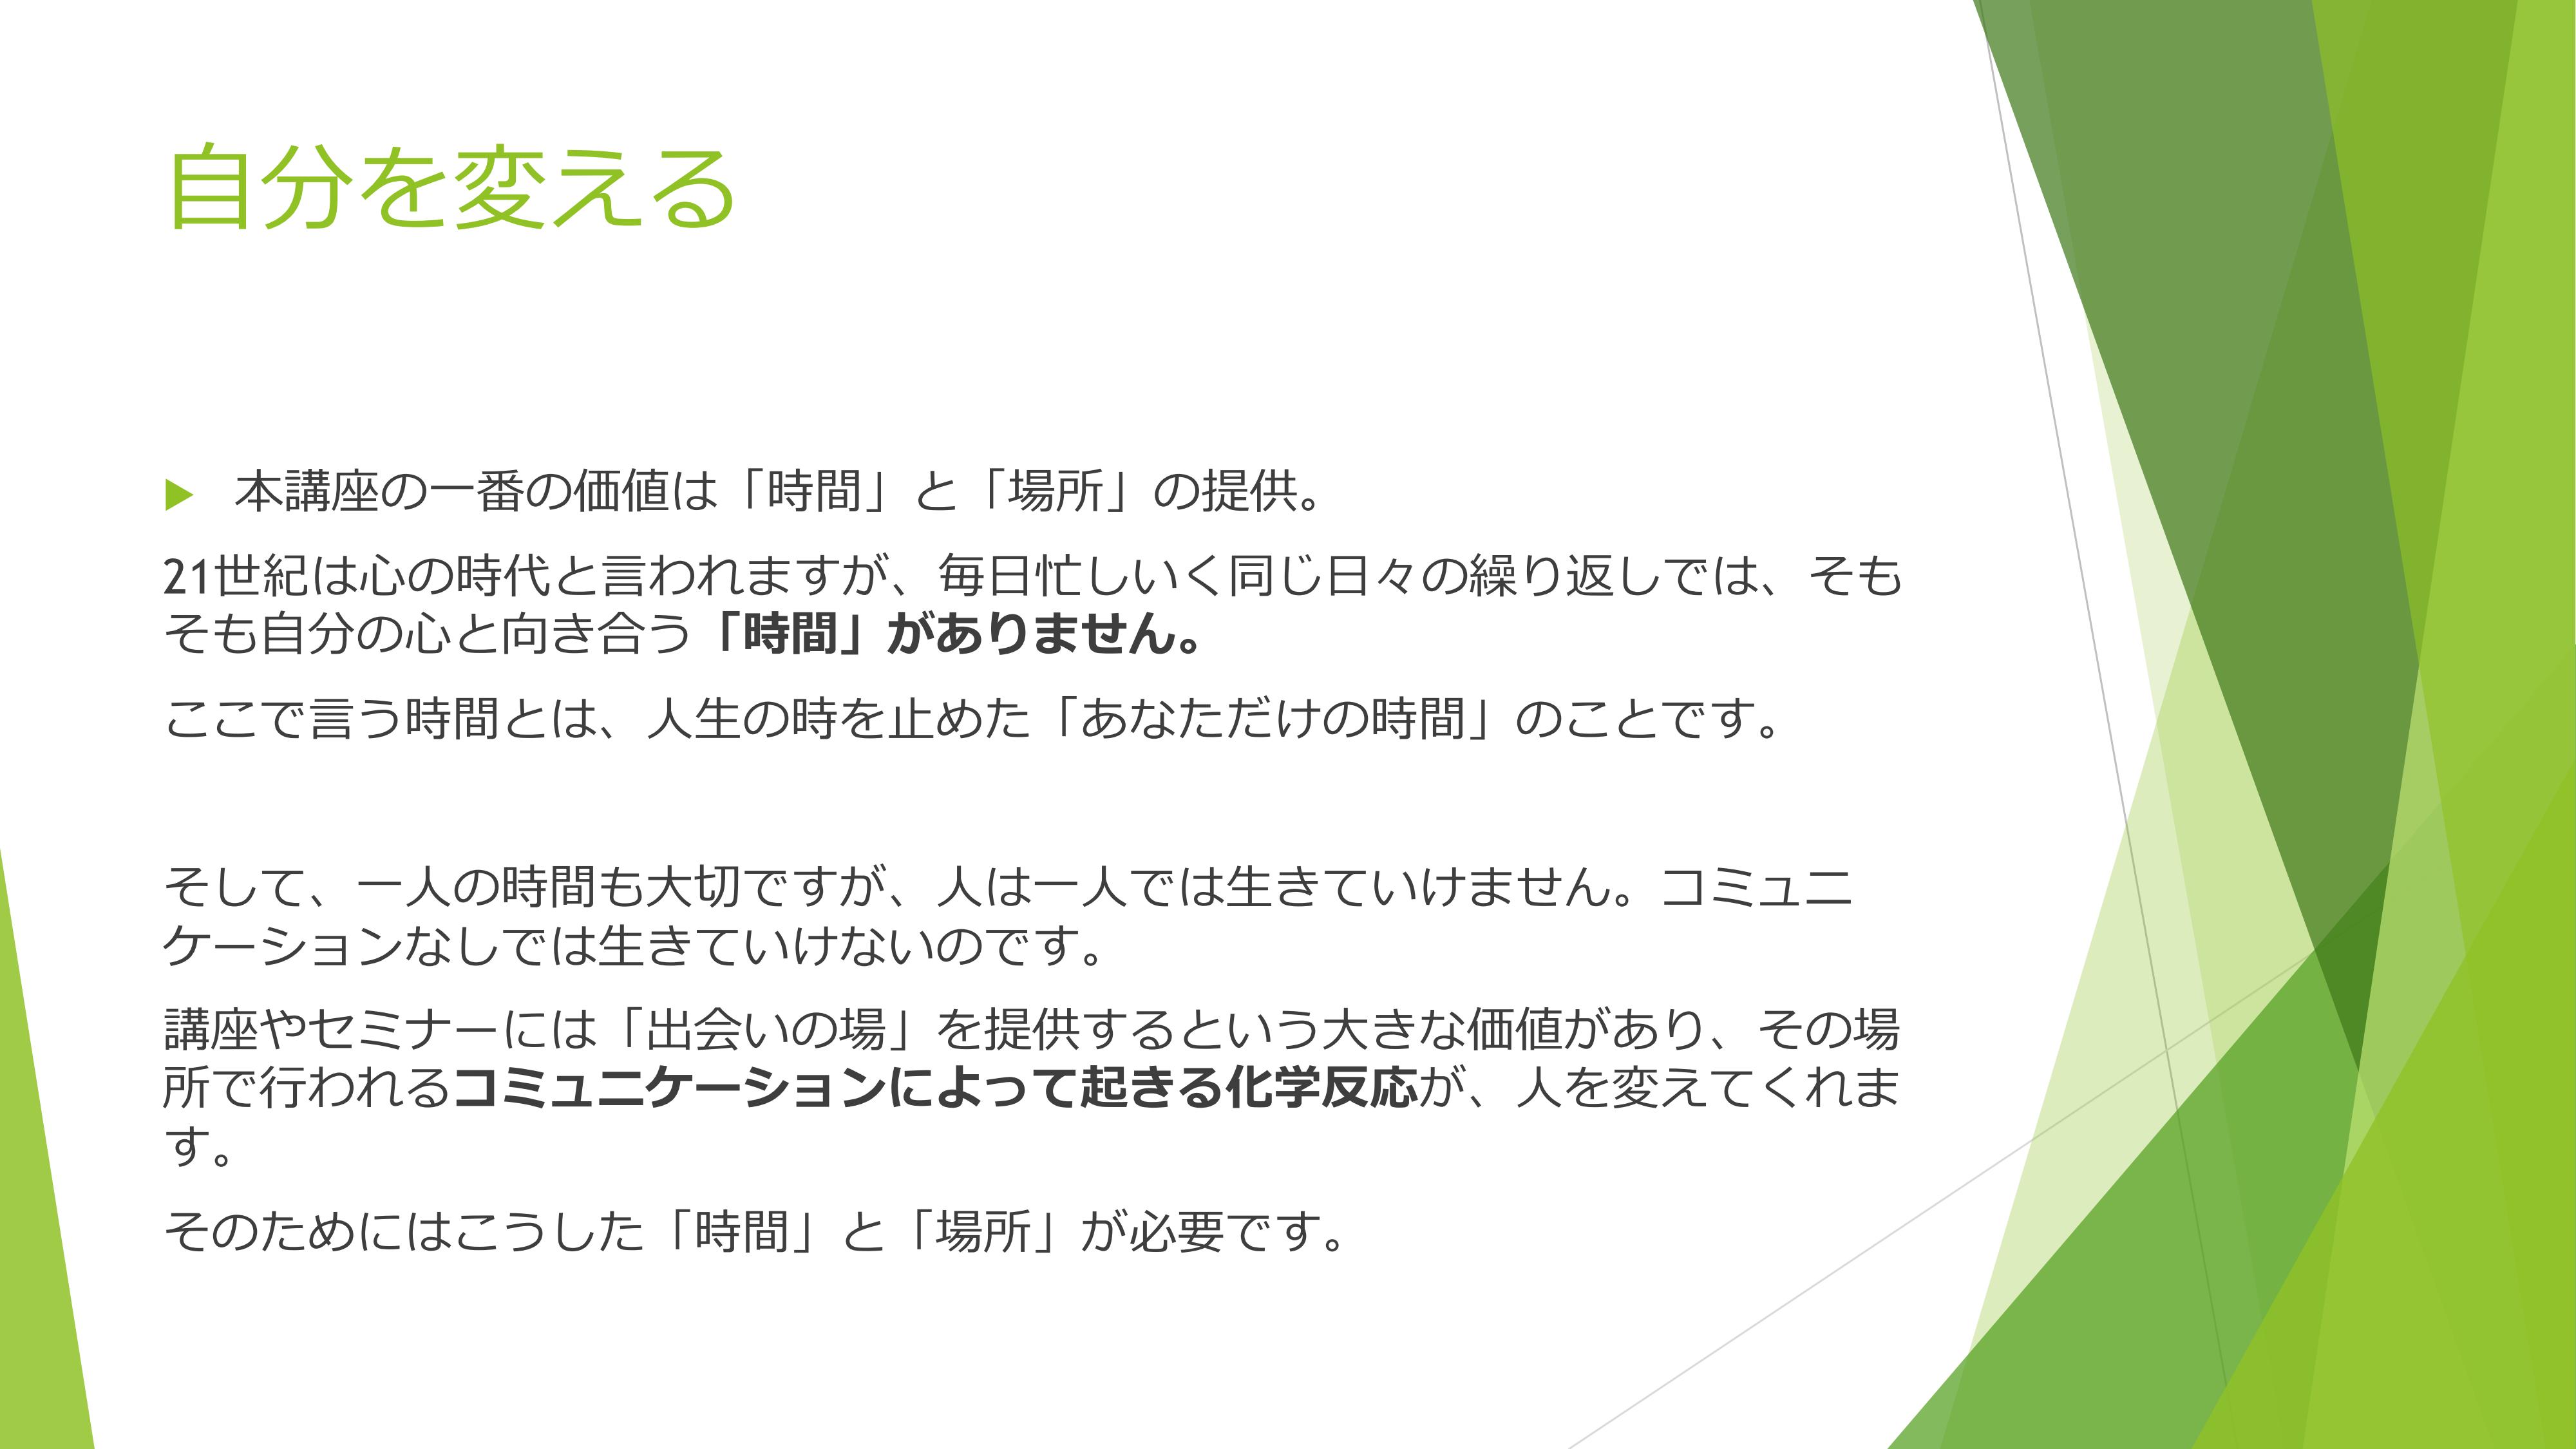 NHK文化センター福岡13